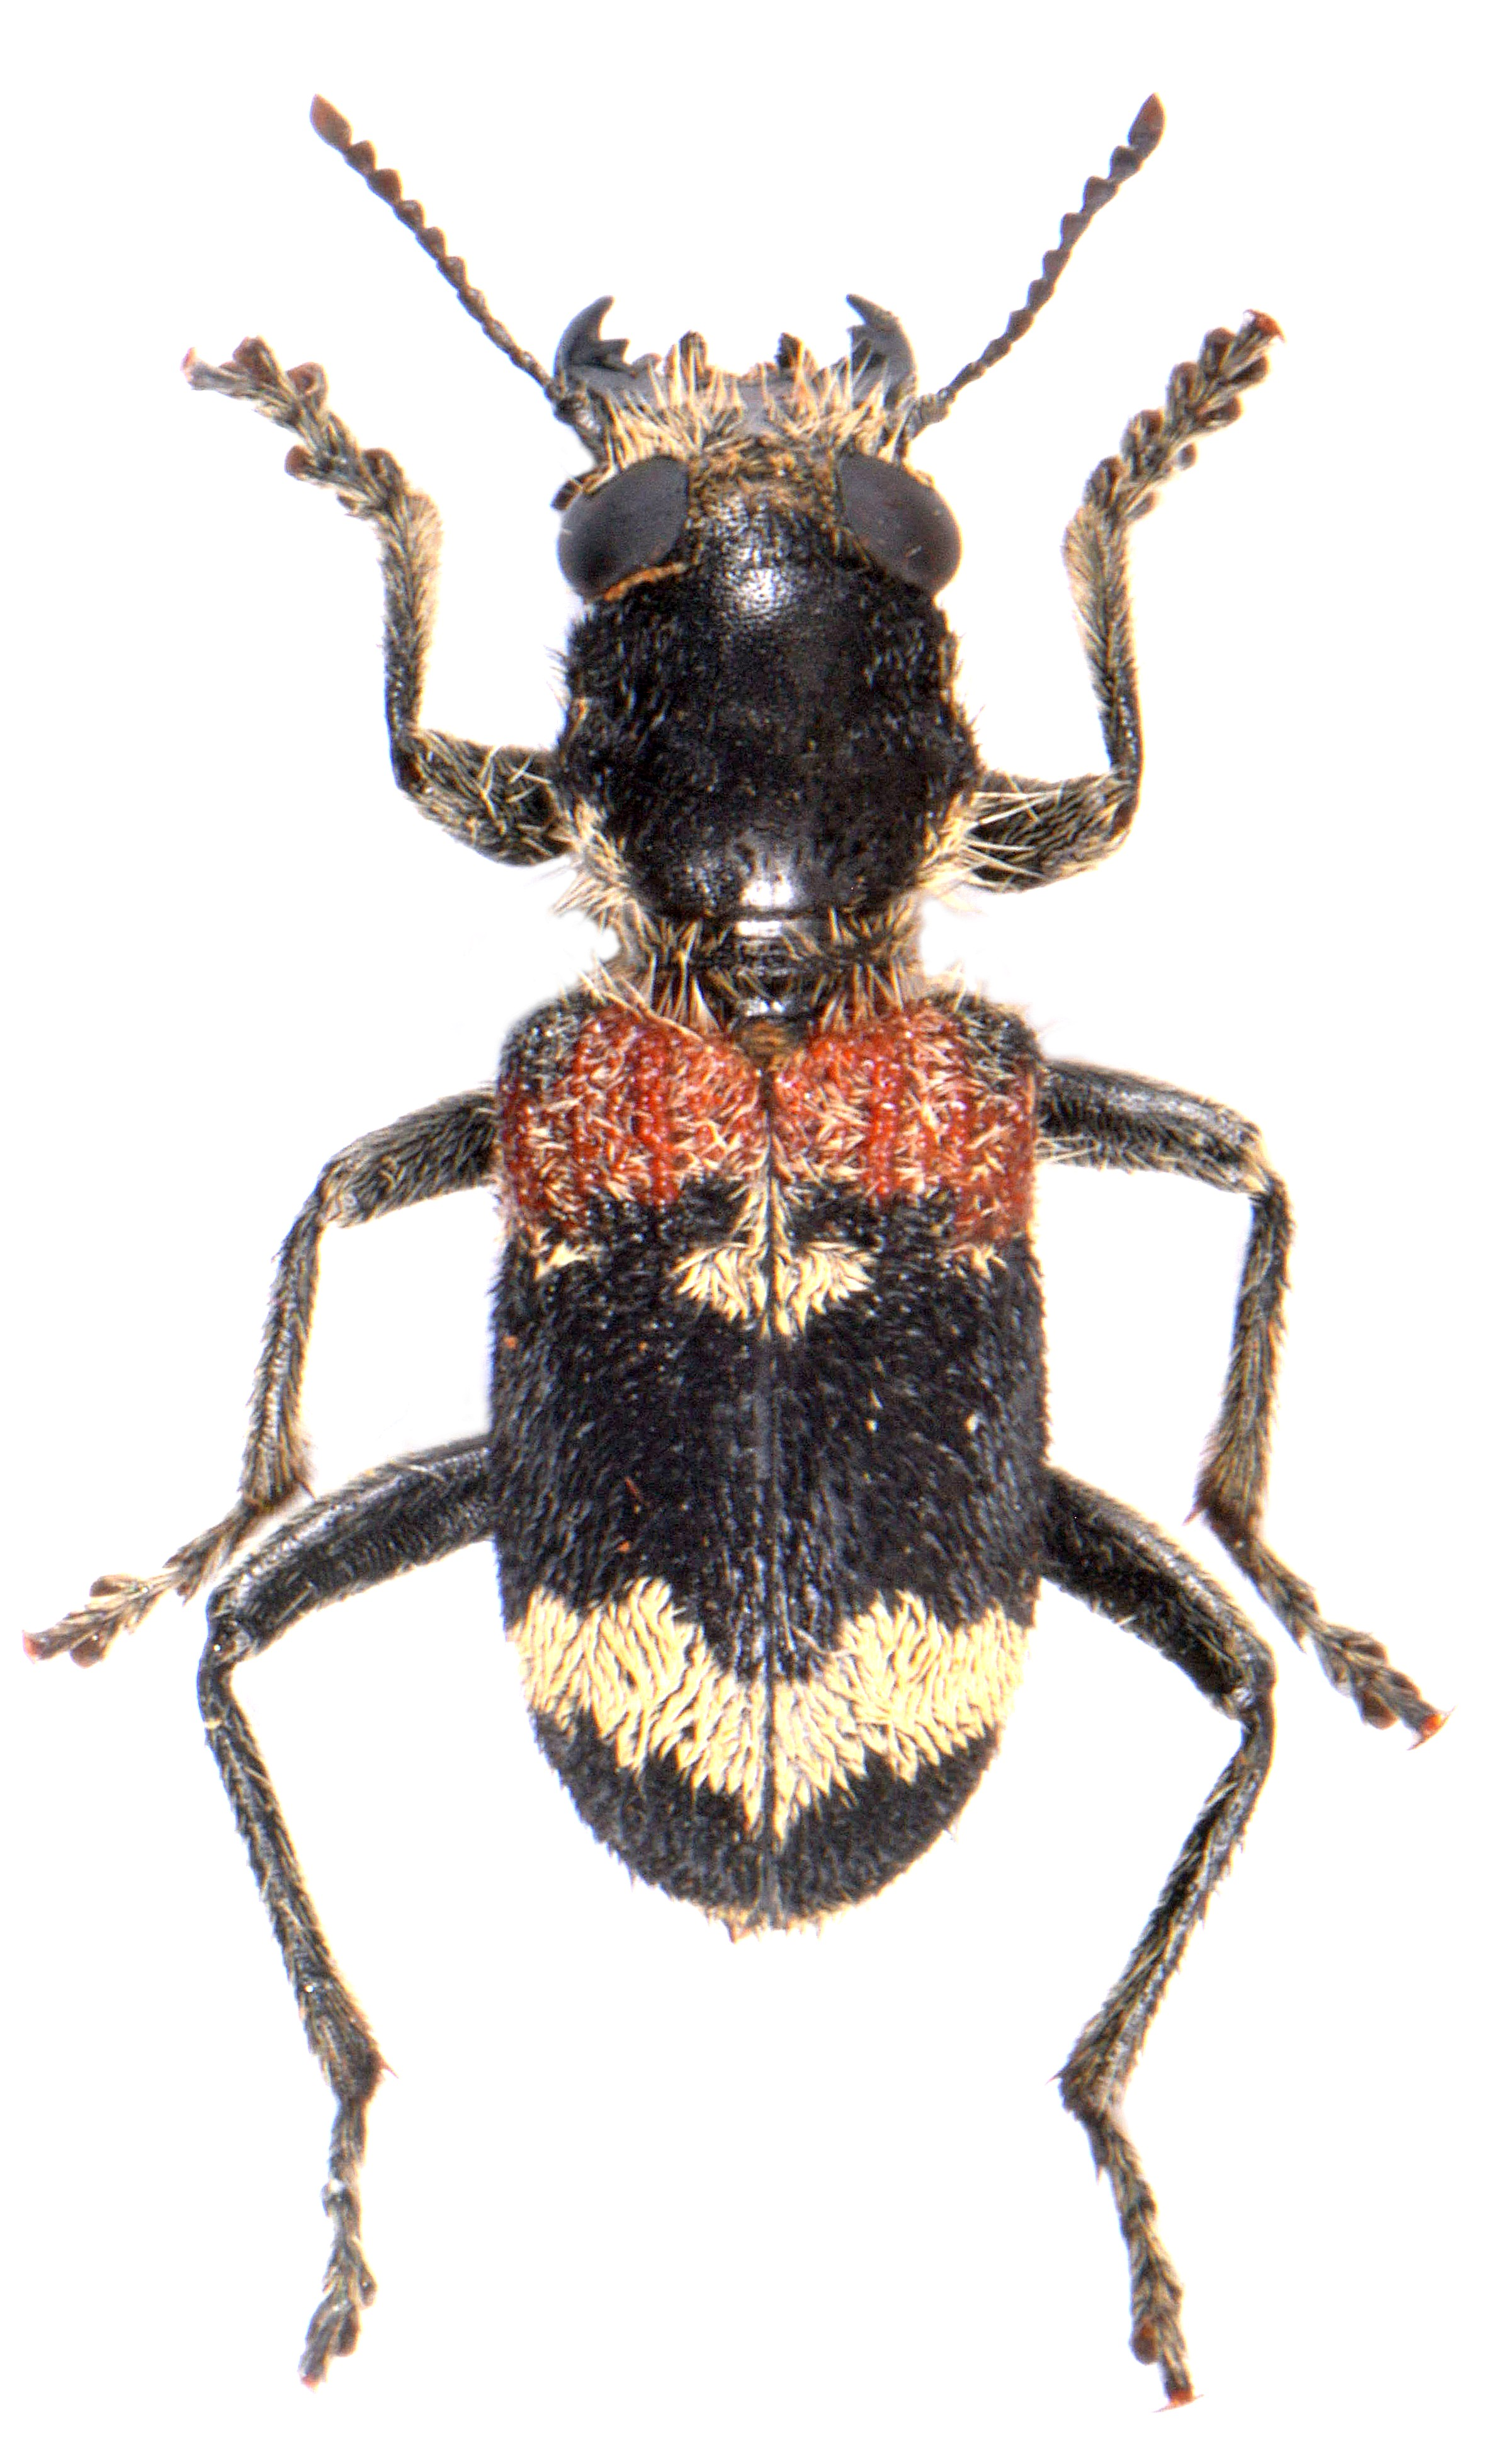 Clerus mutillarius (Slovakia)